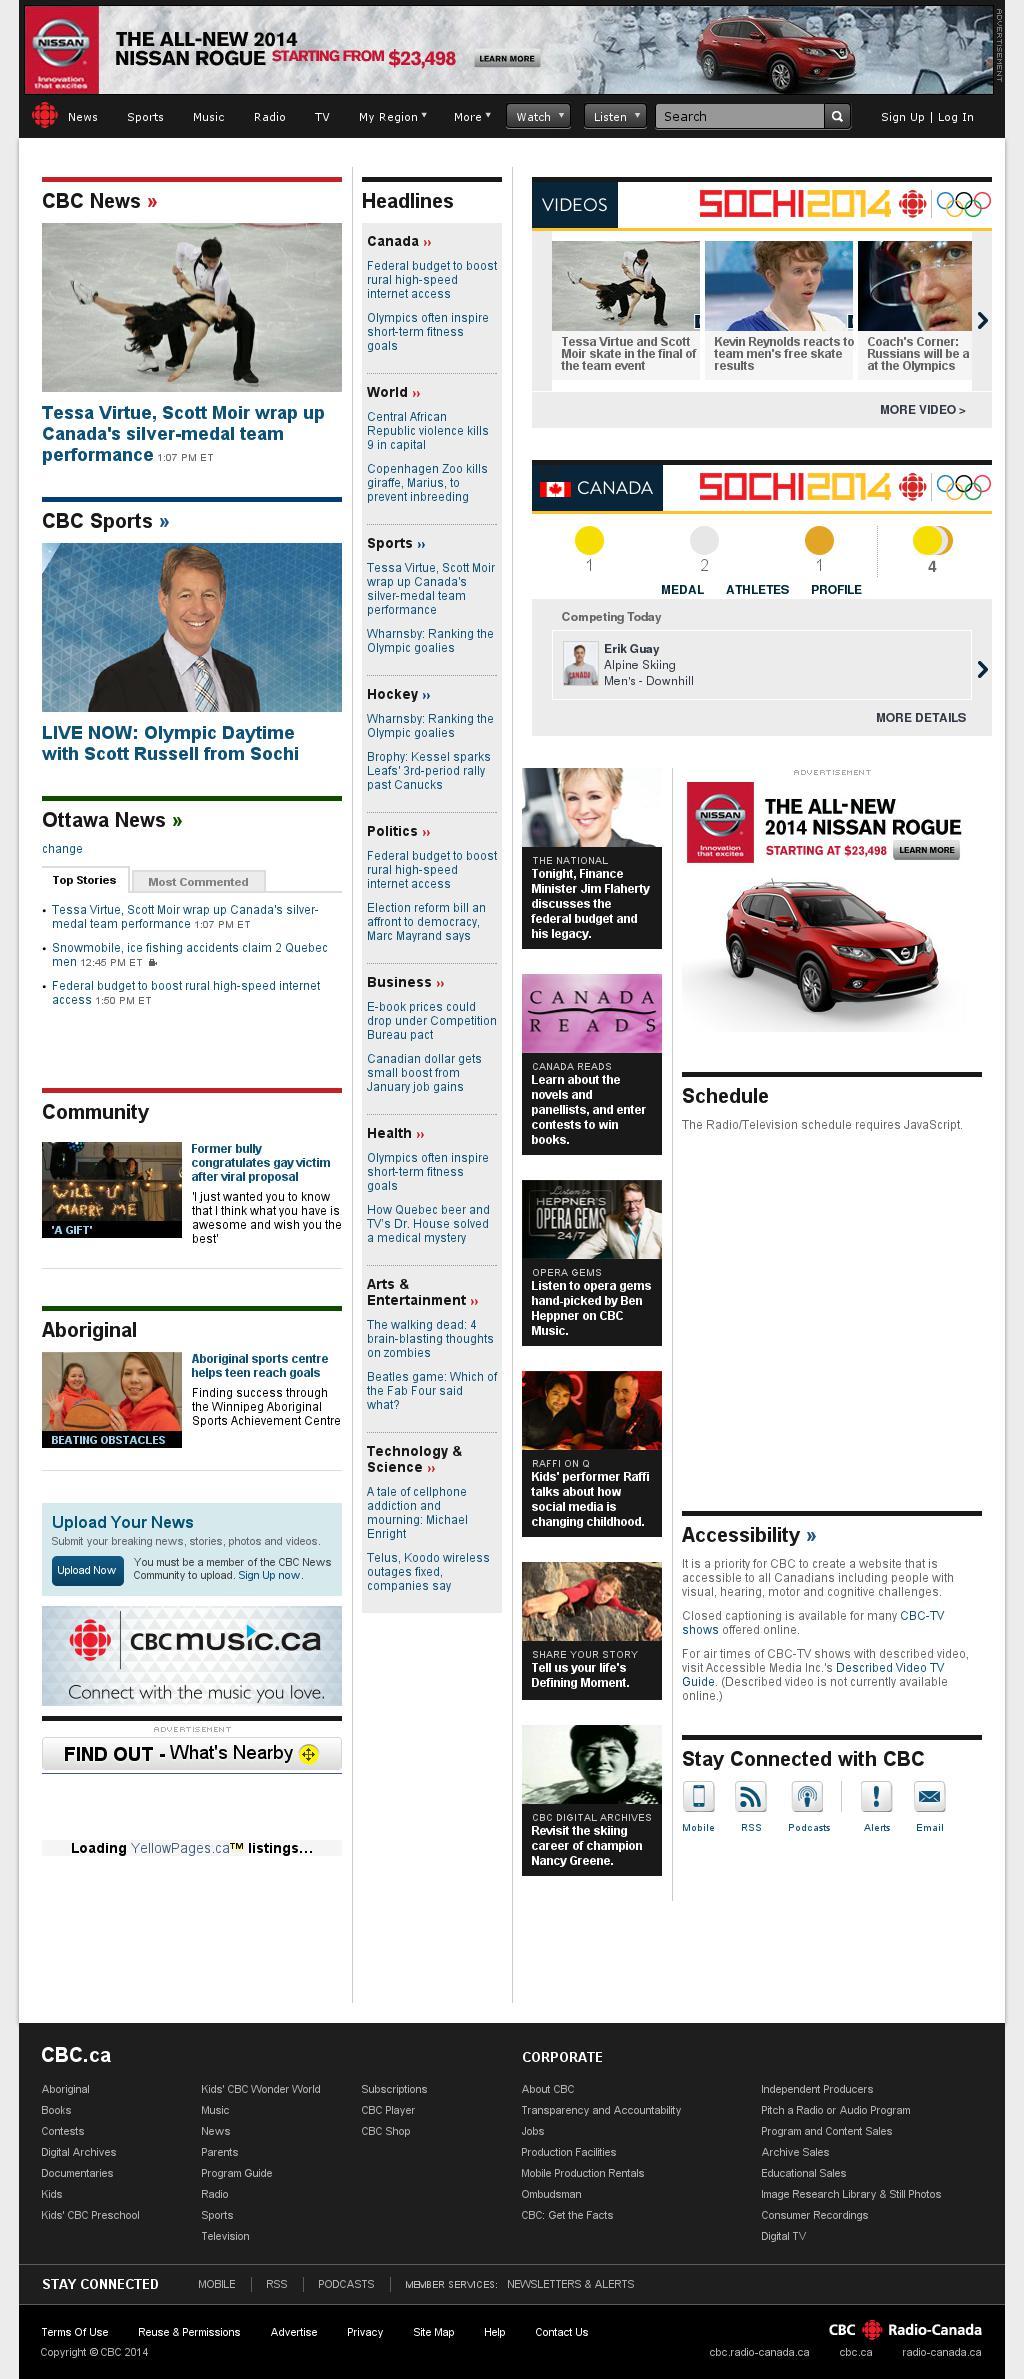 CBC at Sunday Feb. 9, 2014, 7:02 p.m. UTC